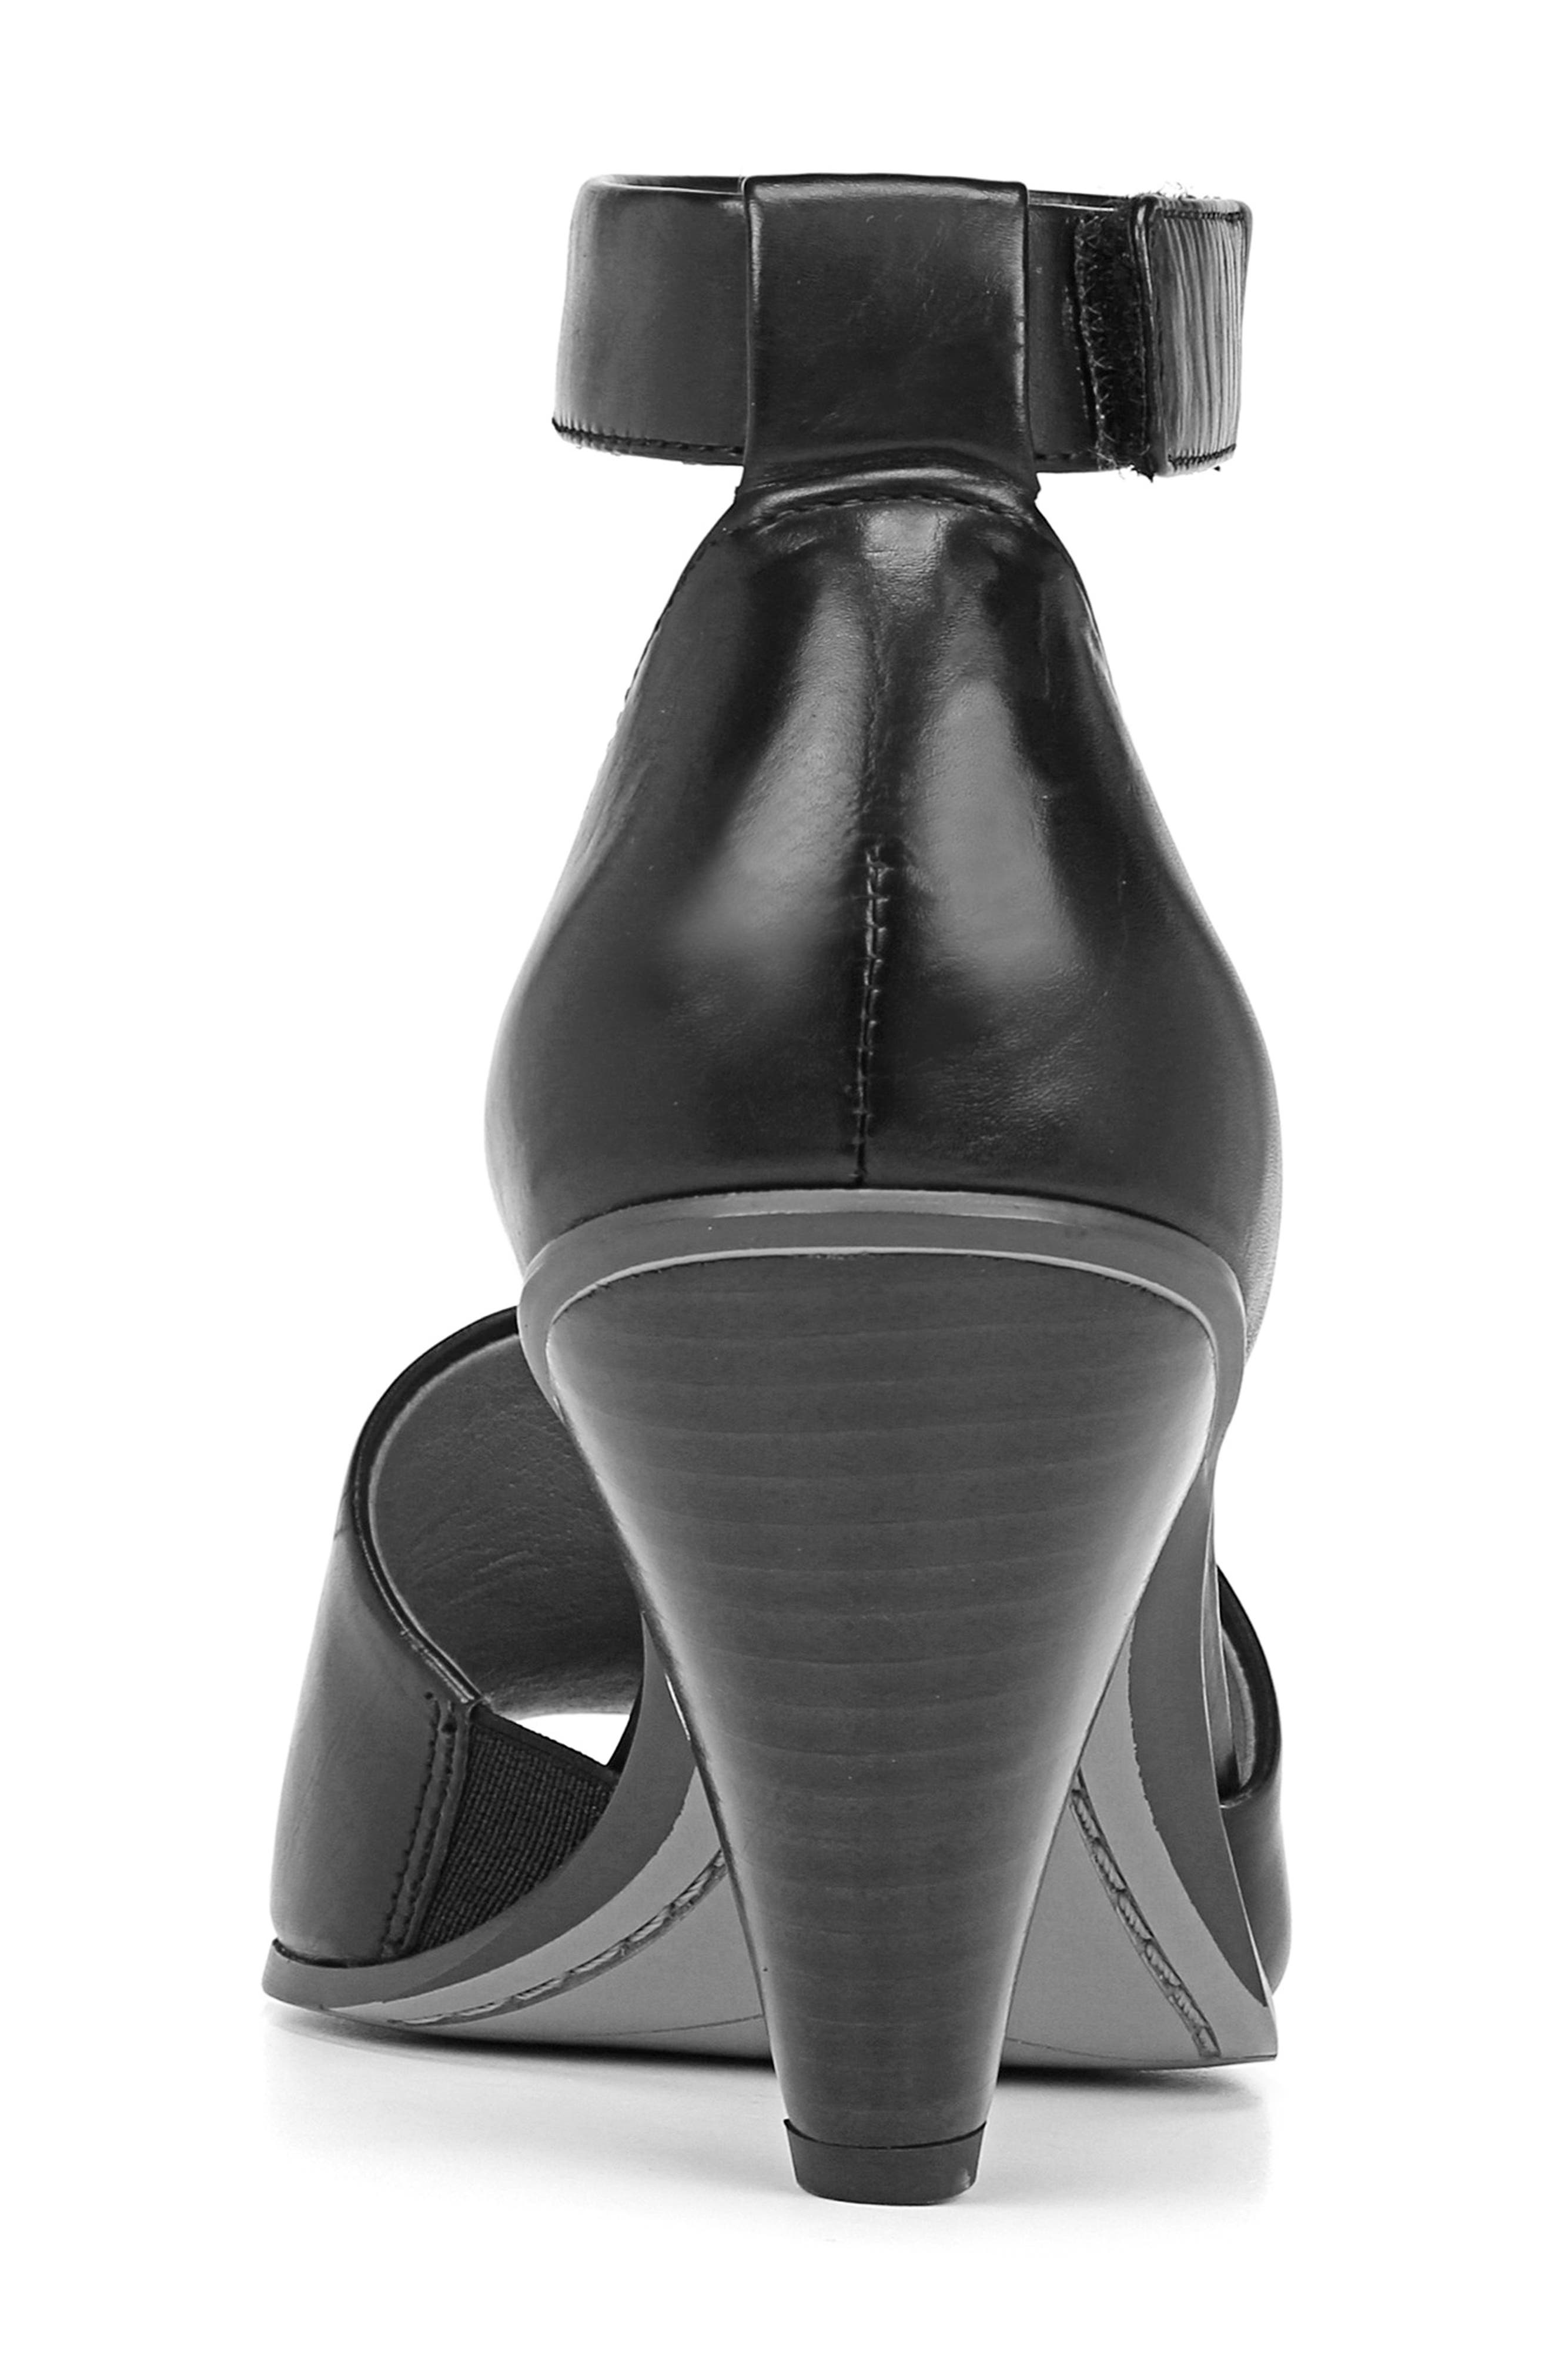 SARTO BY FRANCO SARTO, Ankle Strap Sandal, Alternate thumbnail 8, color, BLACK FOULARD LEATHER